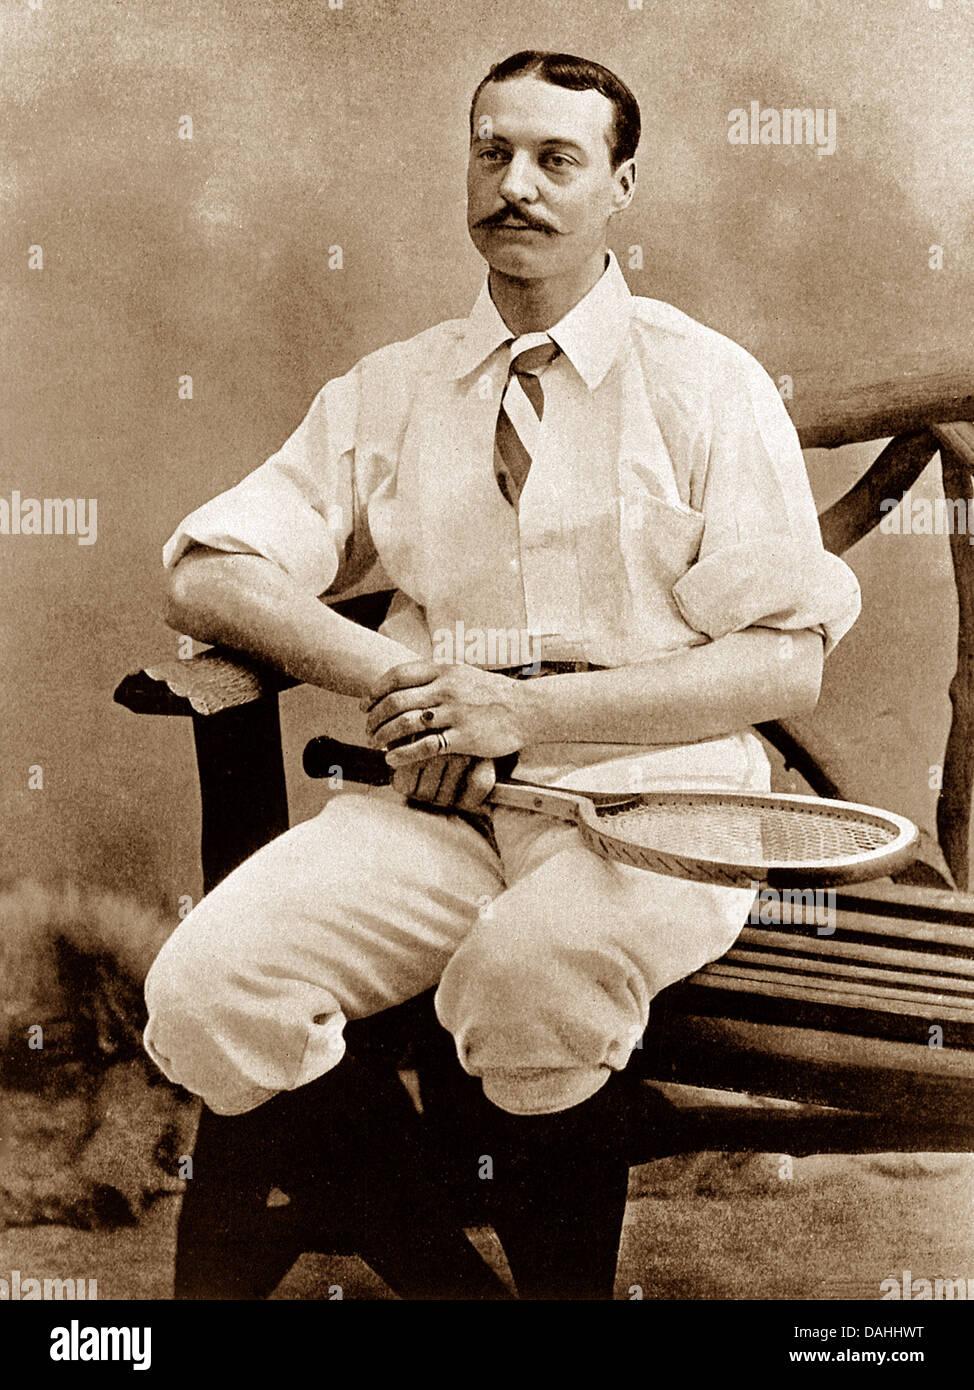 Mr. E W Lewis Tennis Player - Stock Image